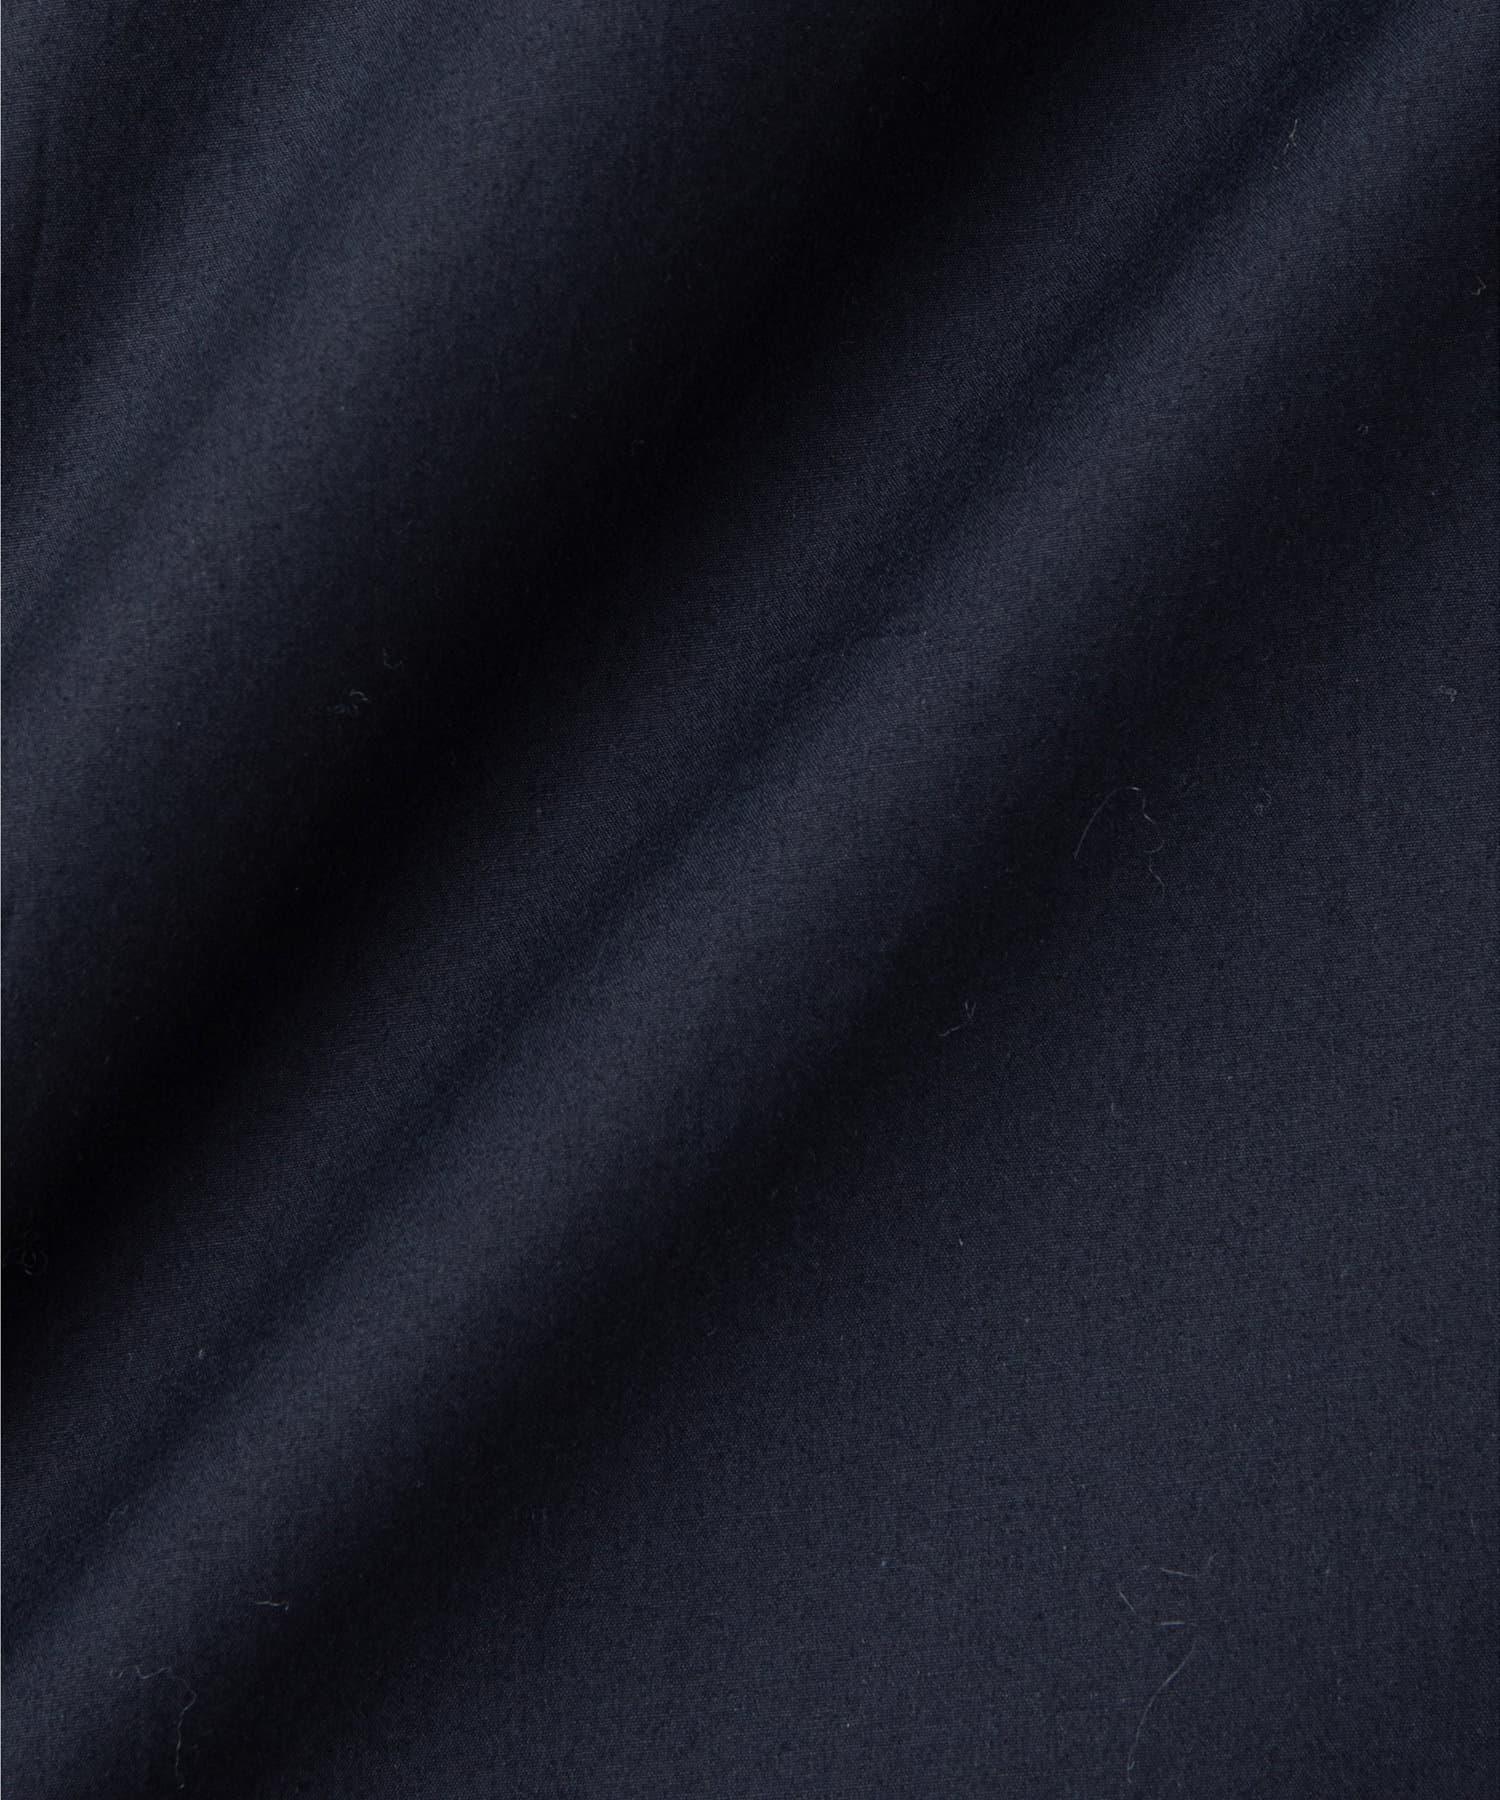 GALLARDAGALANTE(ガリャルダガランテ) 【HERITANOVUM】コットンシルクAロングワンピース